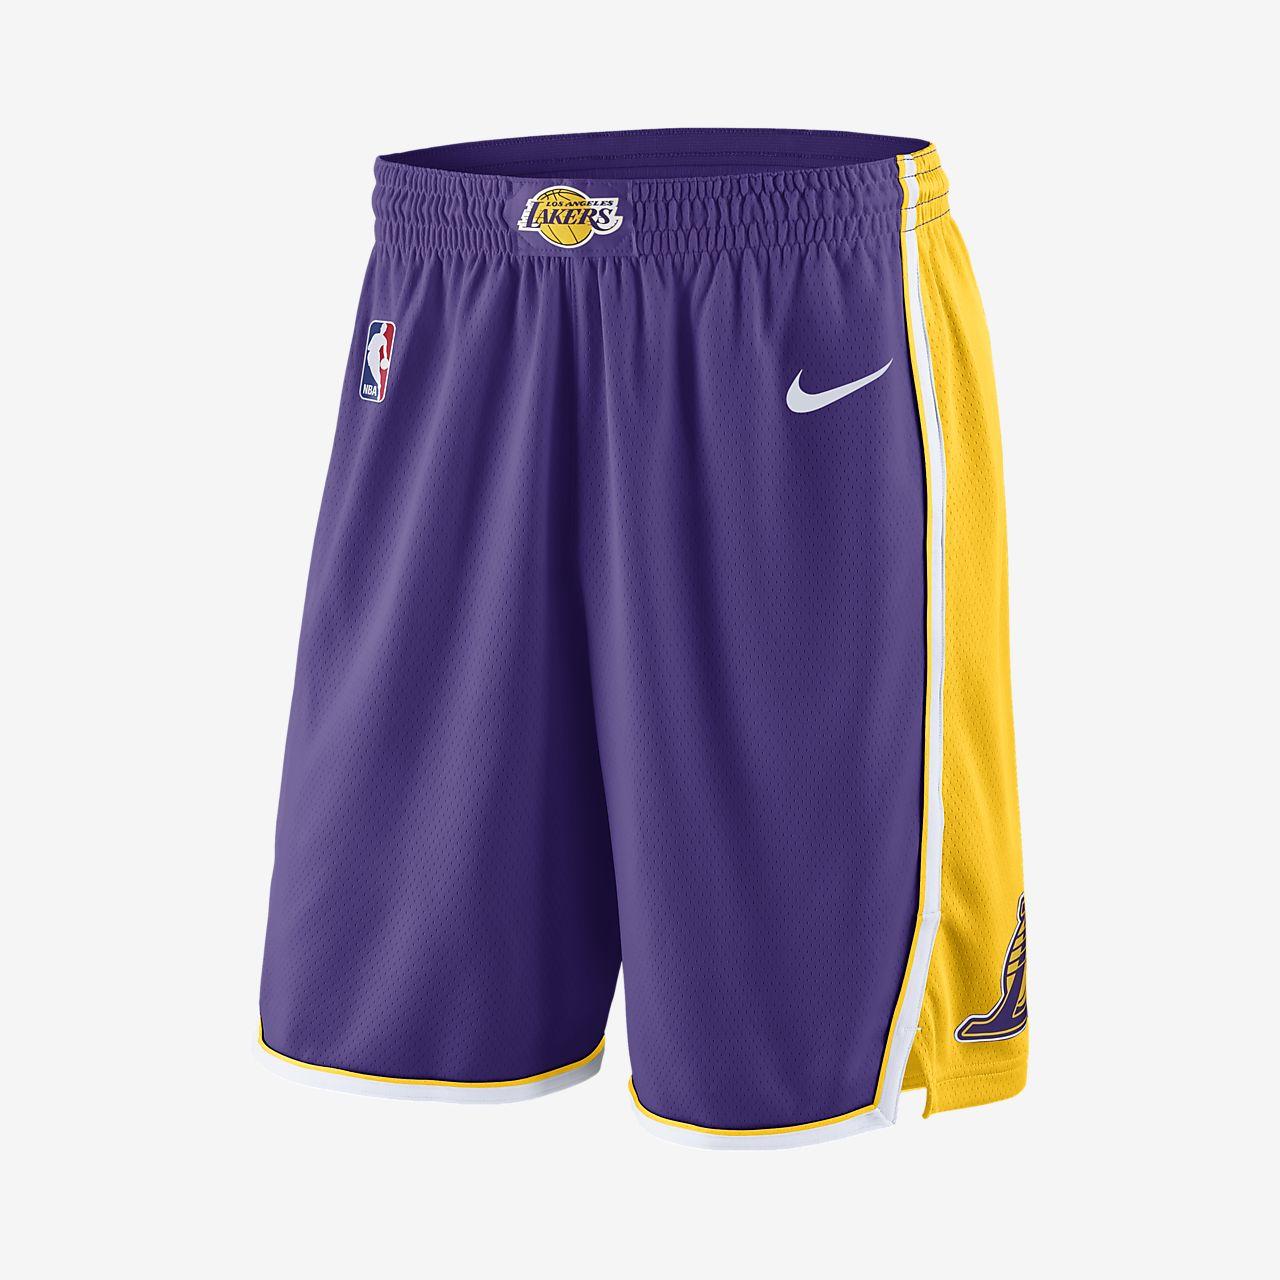 Los Angeles Lakers Nike Statement Edition Swingman Men's NBA Shorts